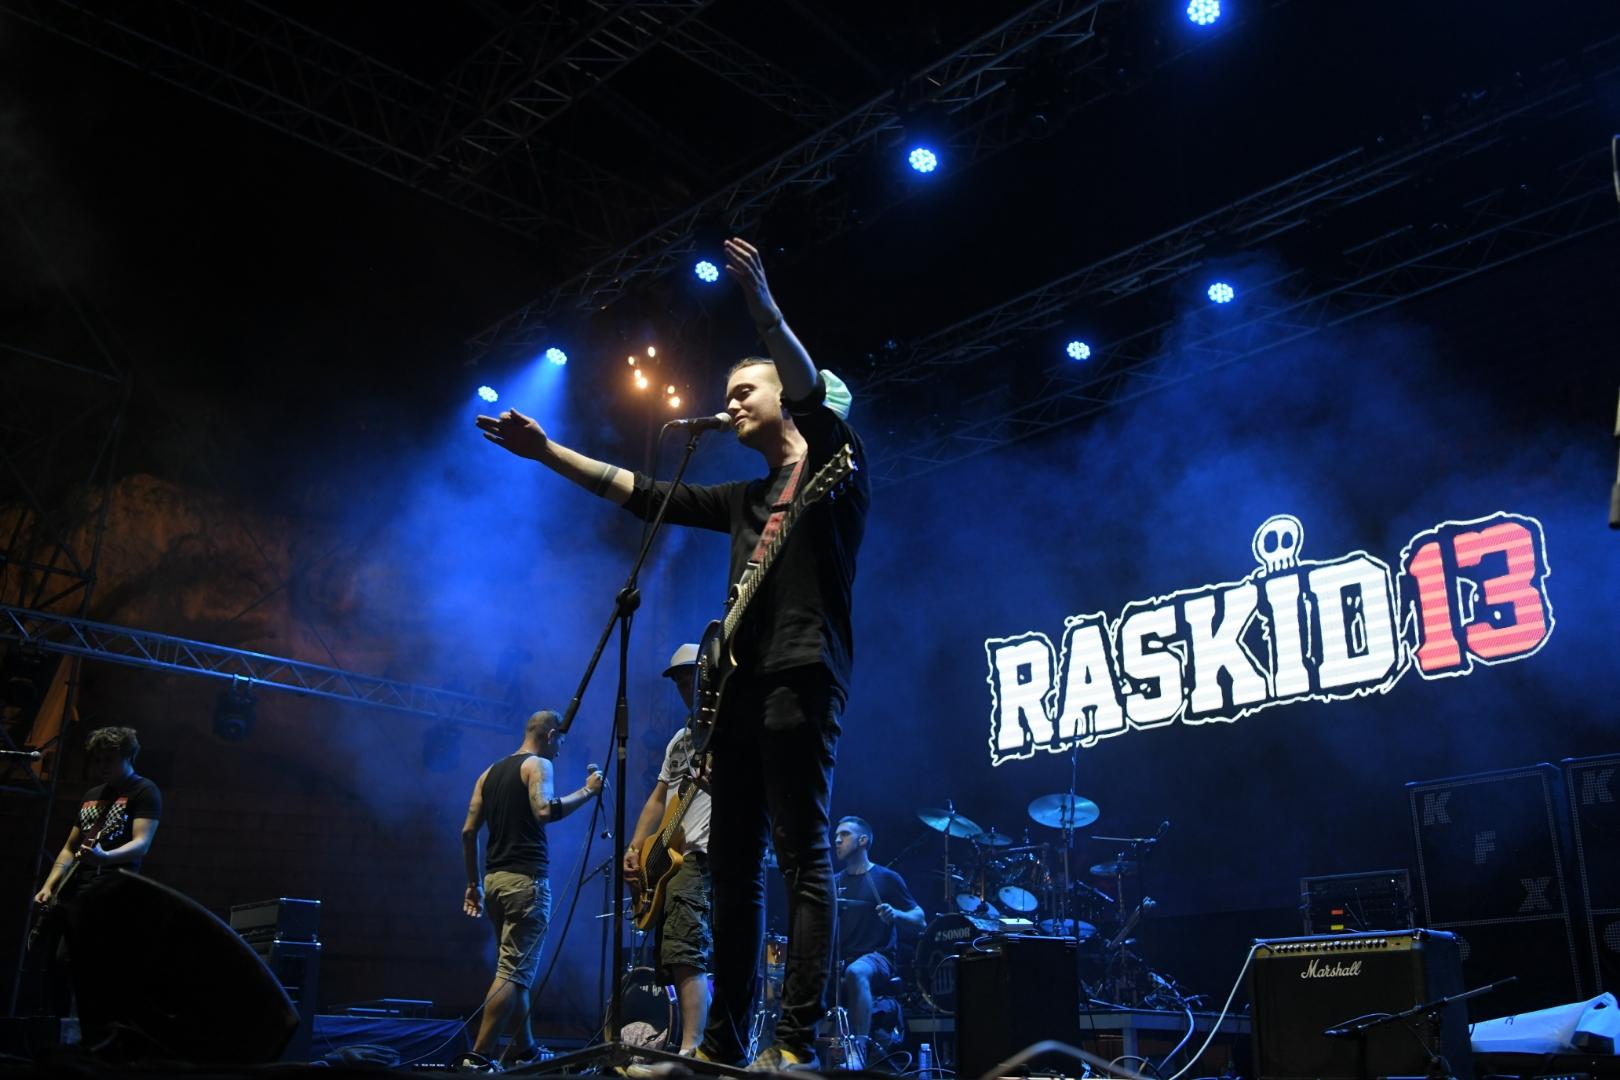 Predgrupa Raskid 13 Koncert grupe Hladno pivo na stadionu Tašmajdan, Stadion Tašmajdan